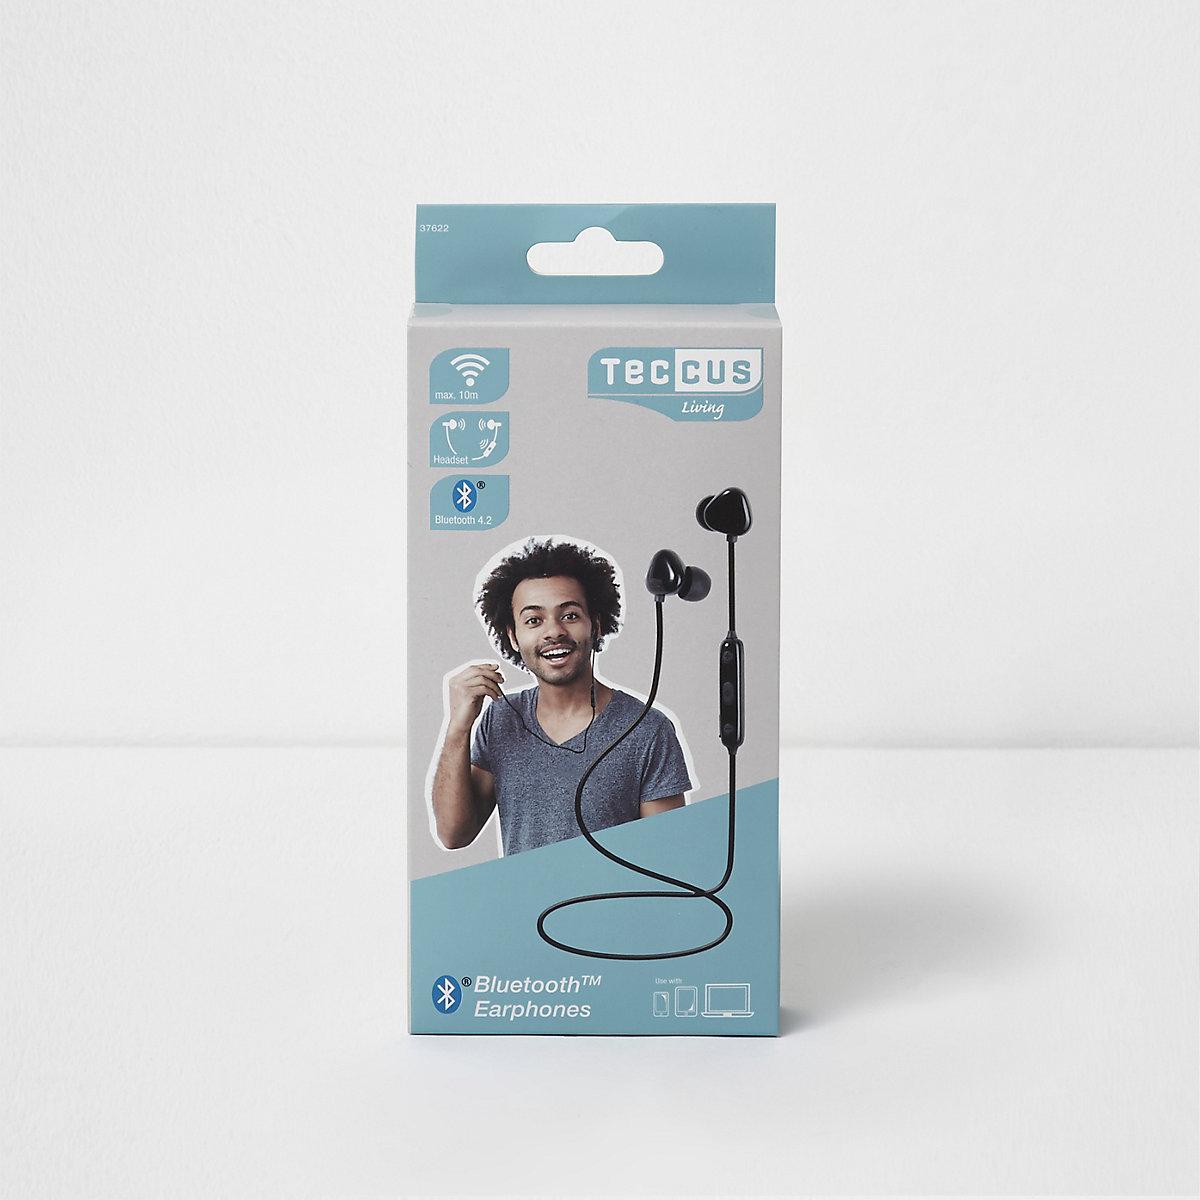 Teccus bluetooth headphones